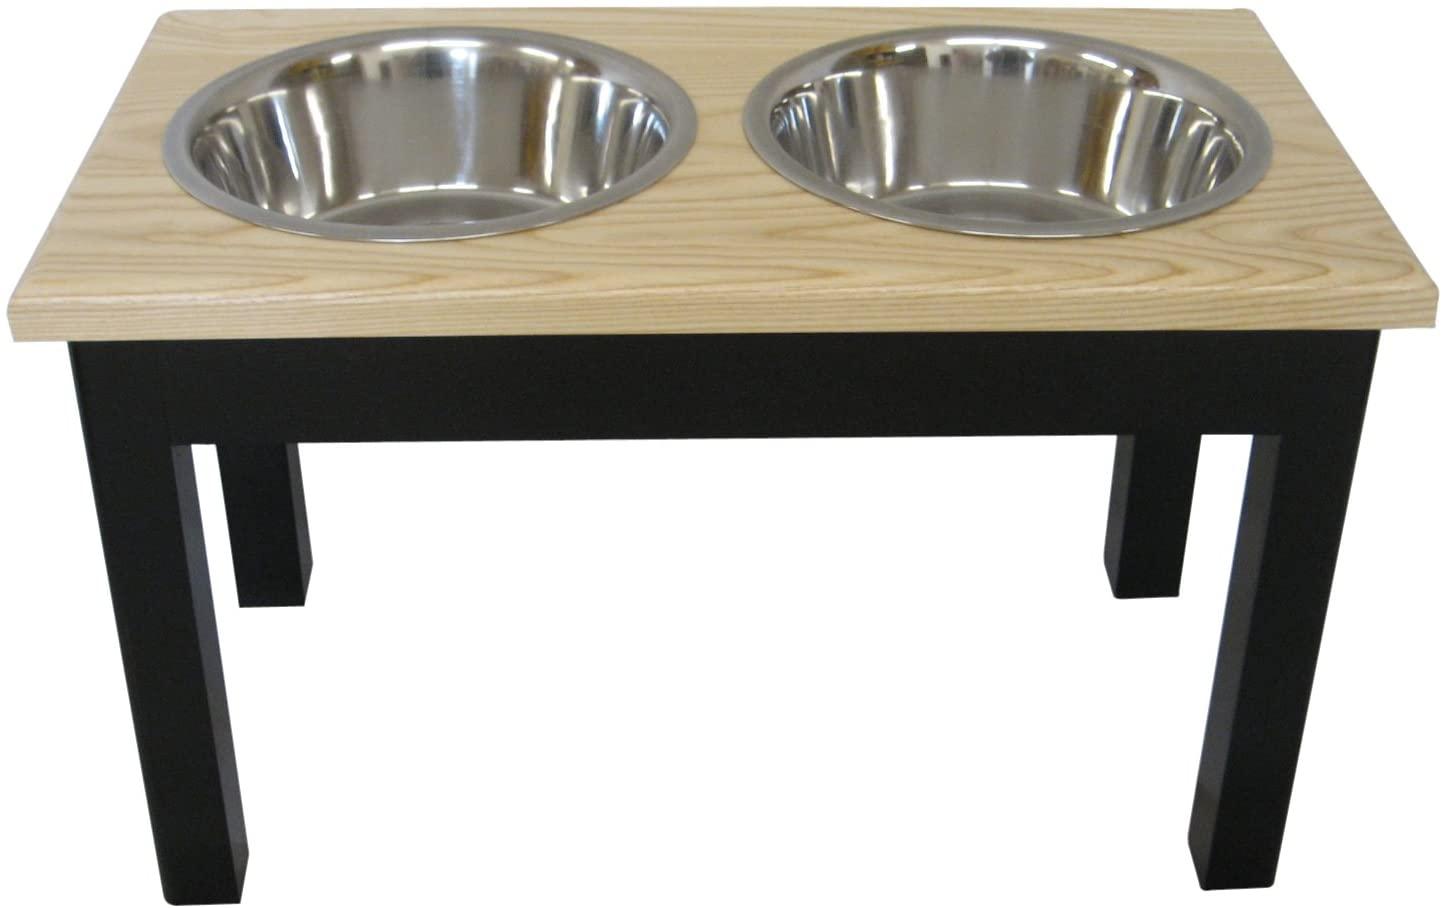 Classic Pet Beds 2-Bowl Traditional Style 2-Quart Ash Pet Diner, Medium, Espresso/Natural